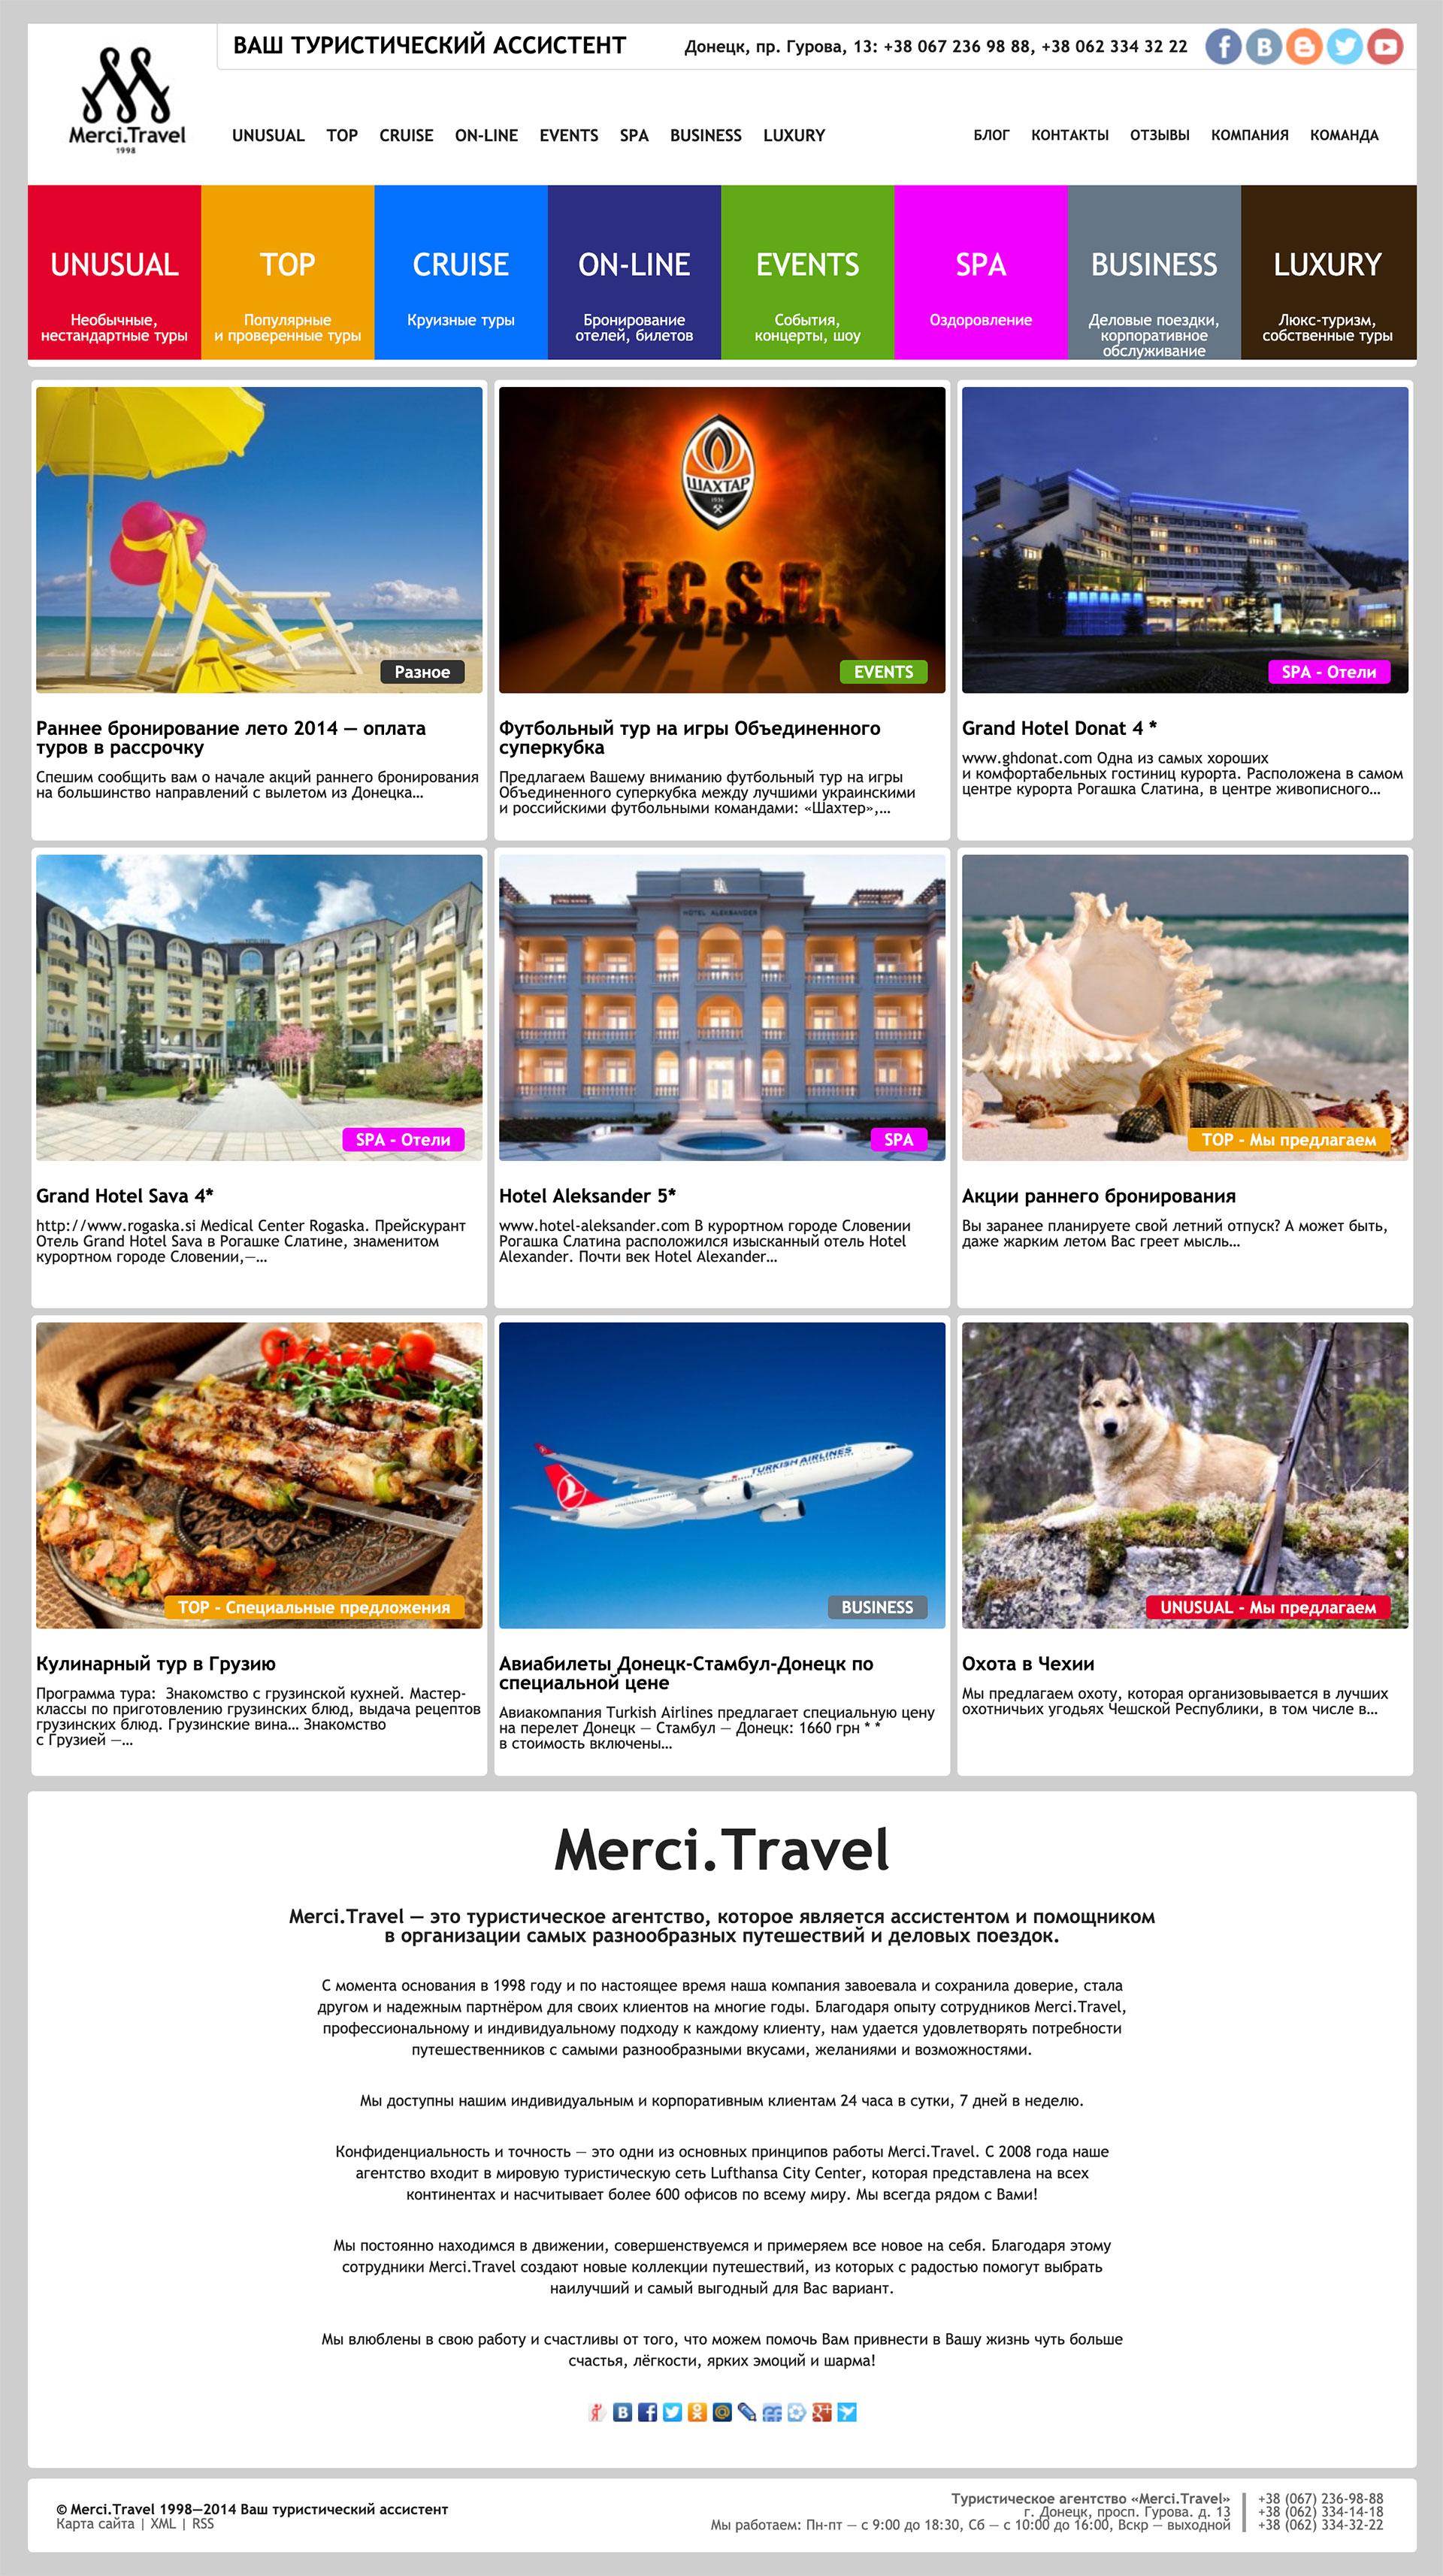 https://danilin.biz/wp-content/uploads/2021/02/merci-travel-travel-agency-ukraine-website-redesign.jpg